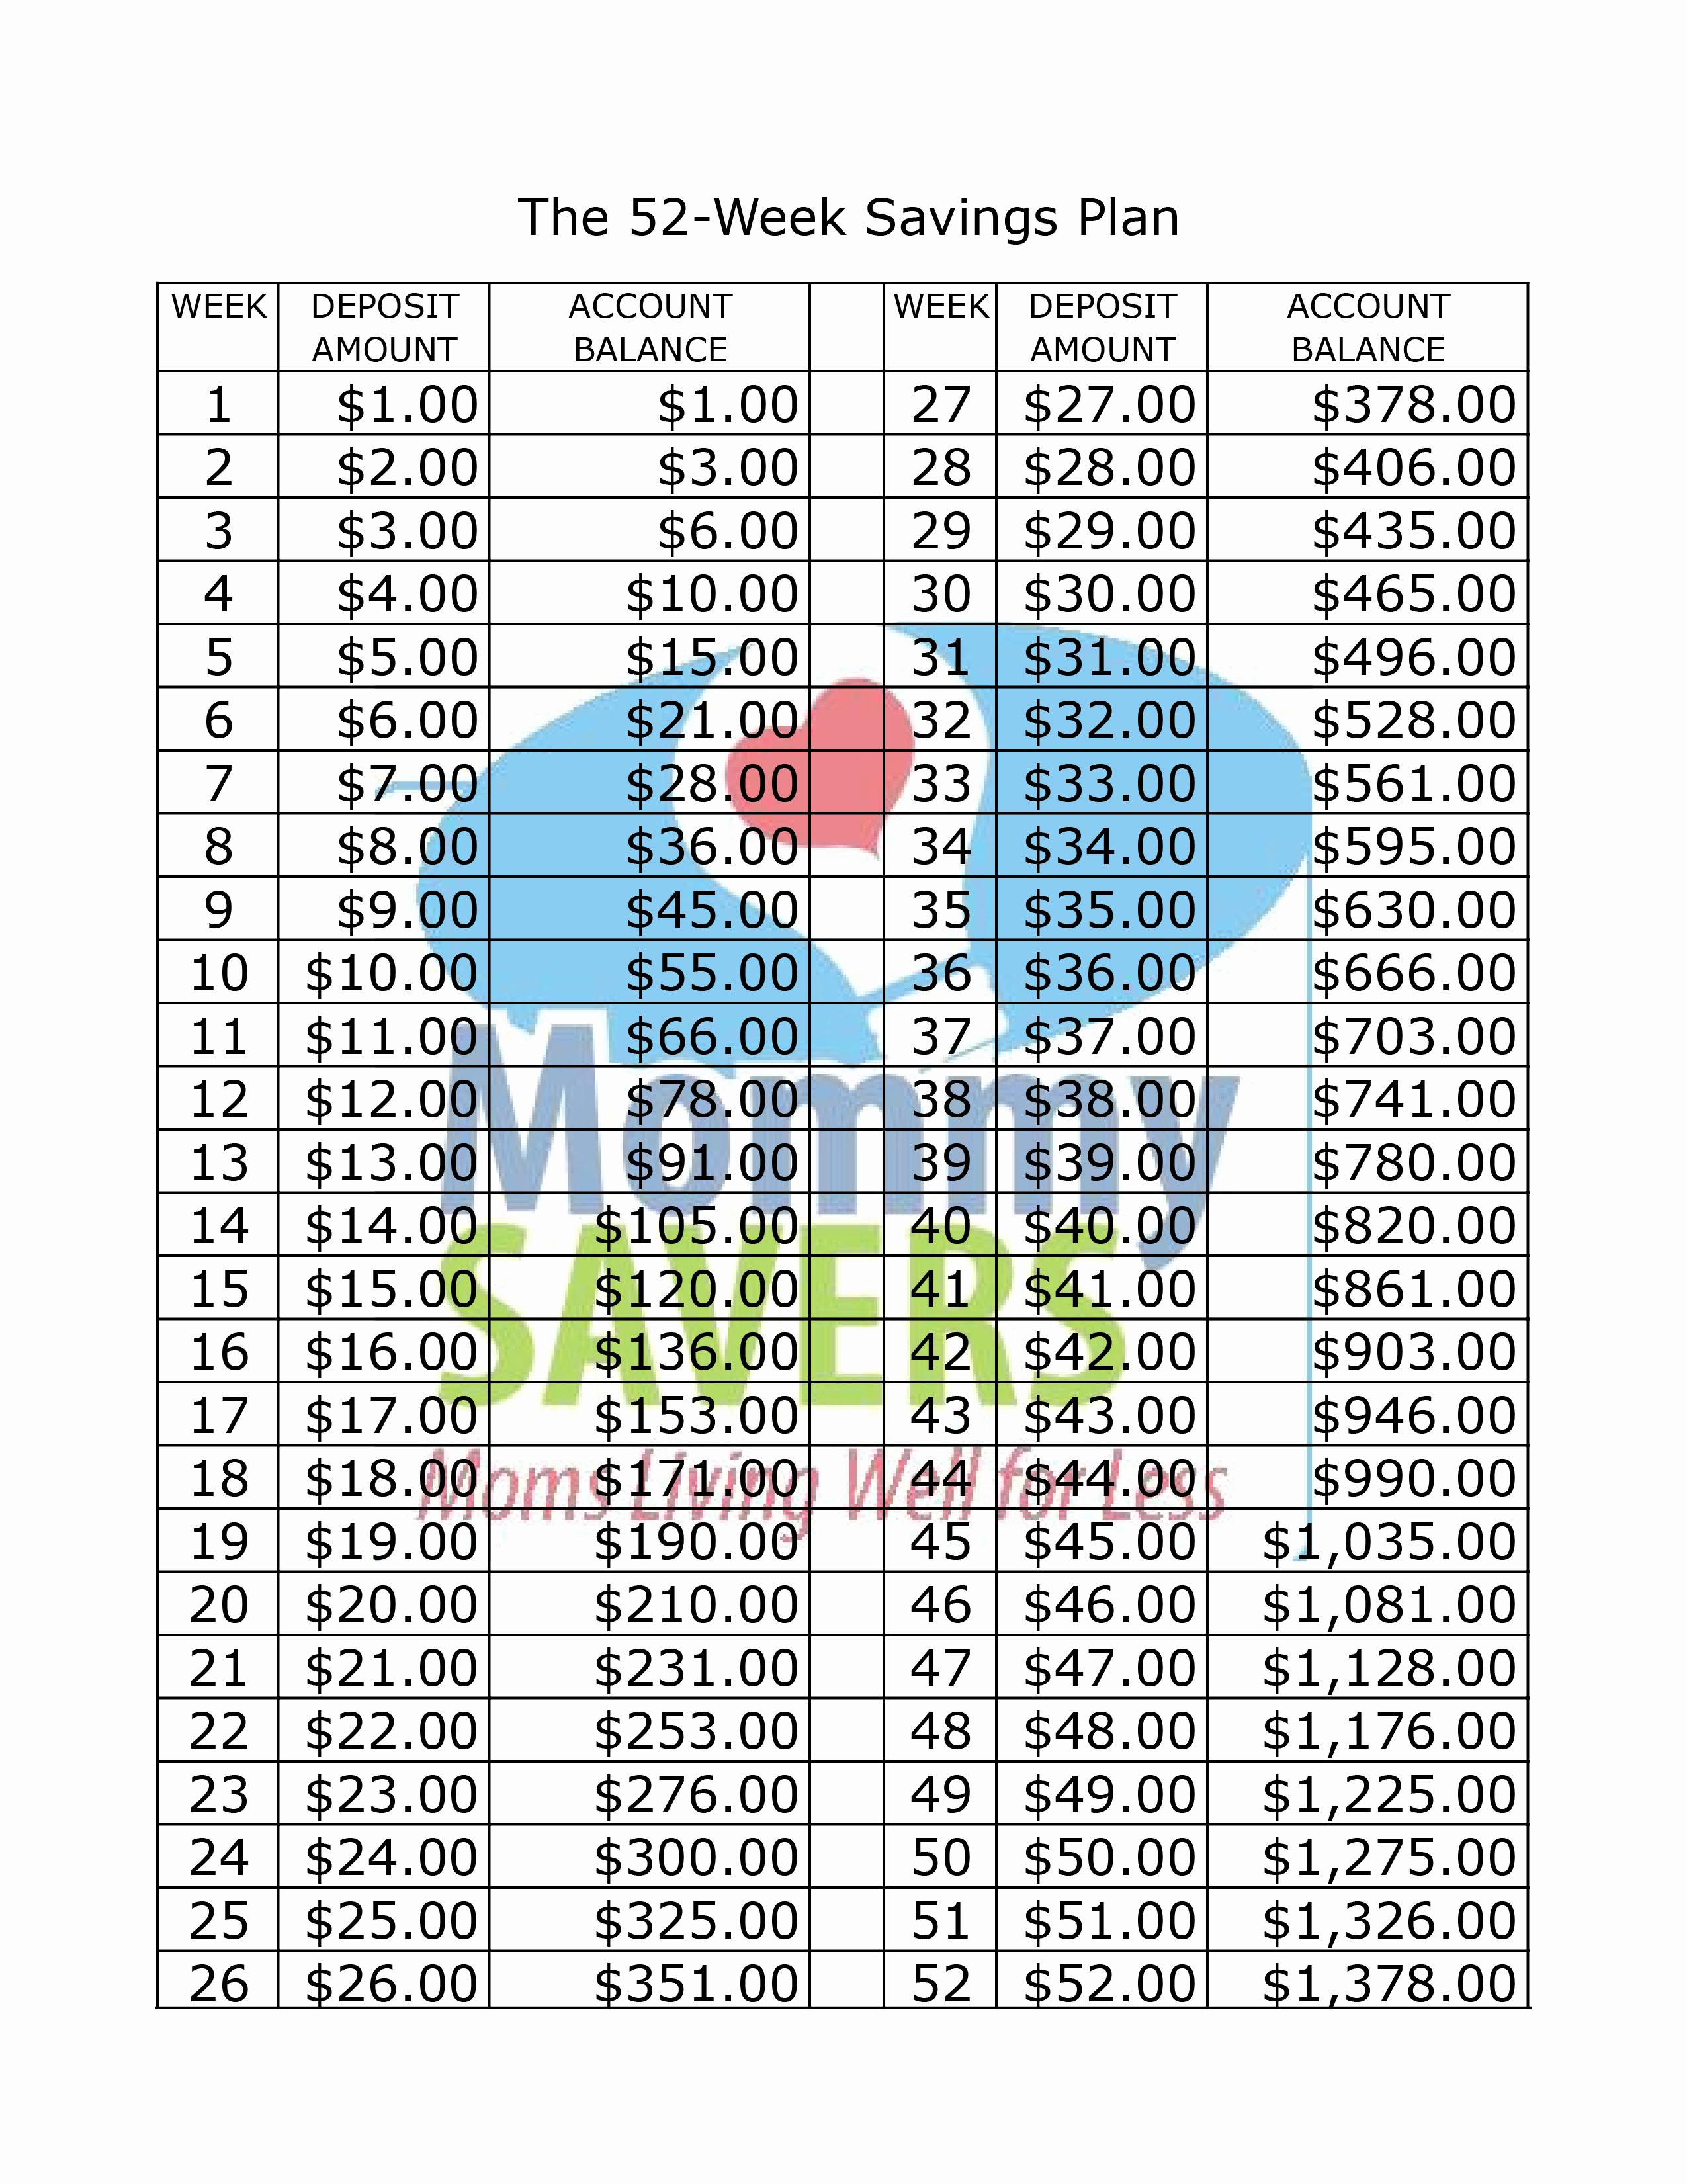 Financial Savings Plan Spreadsheet Pertaining To Weekgs Plan Spreadsheet Excel In Rands  Askoverflow